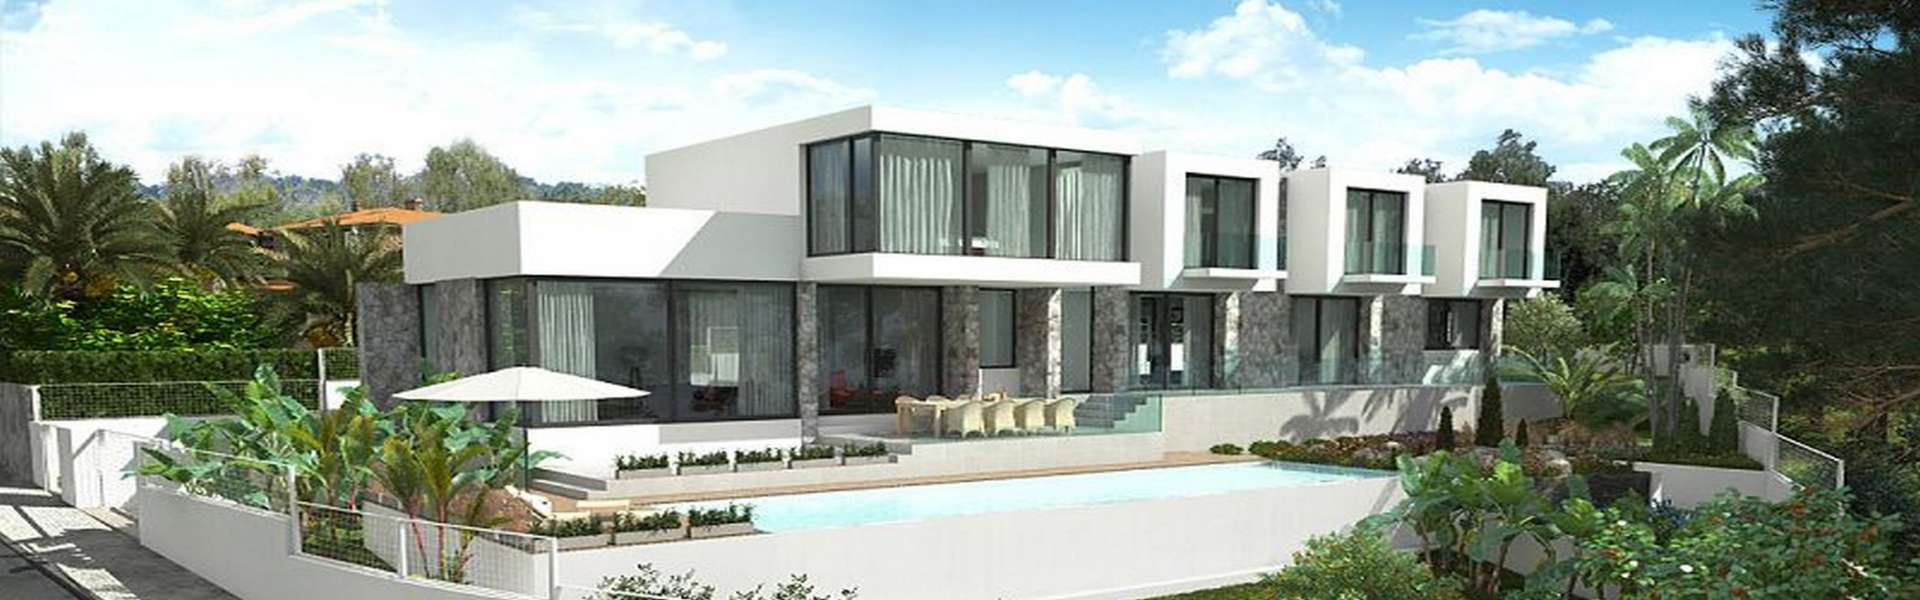 Cala Vinyes - Attraktives Neubauprojekt mit Meerblick